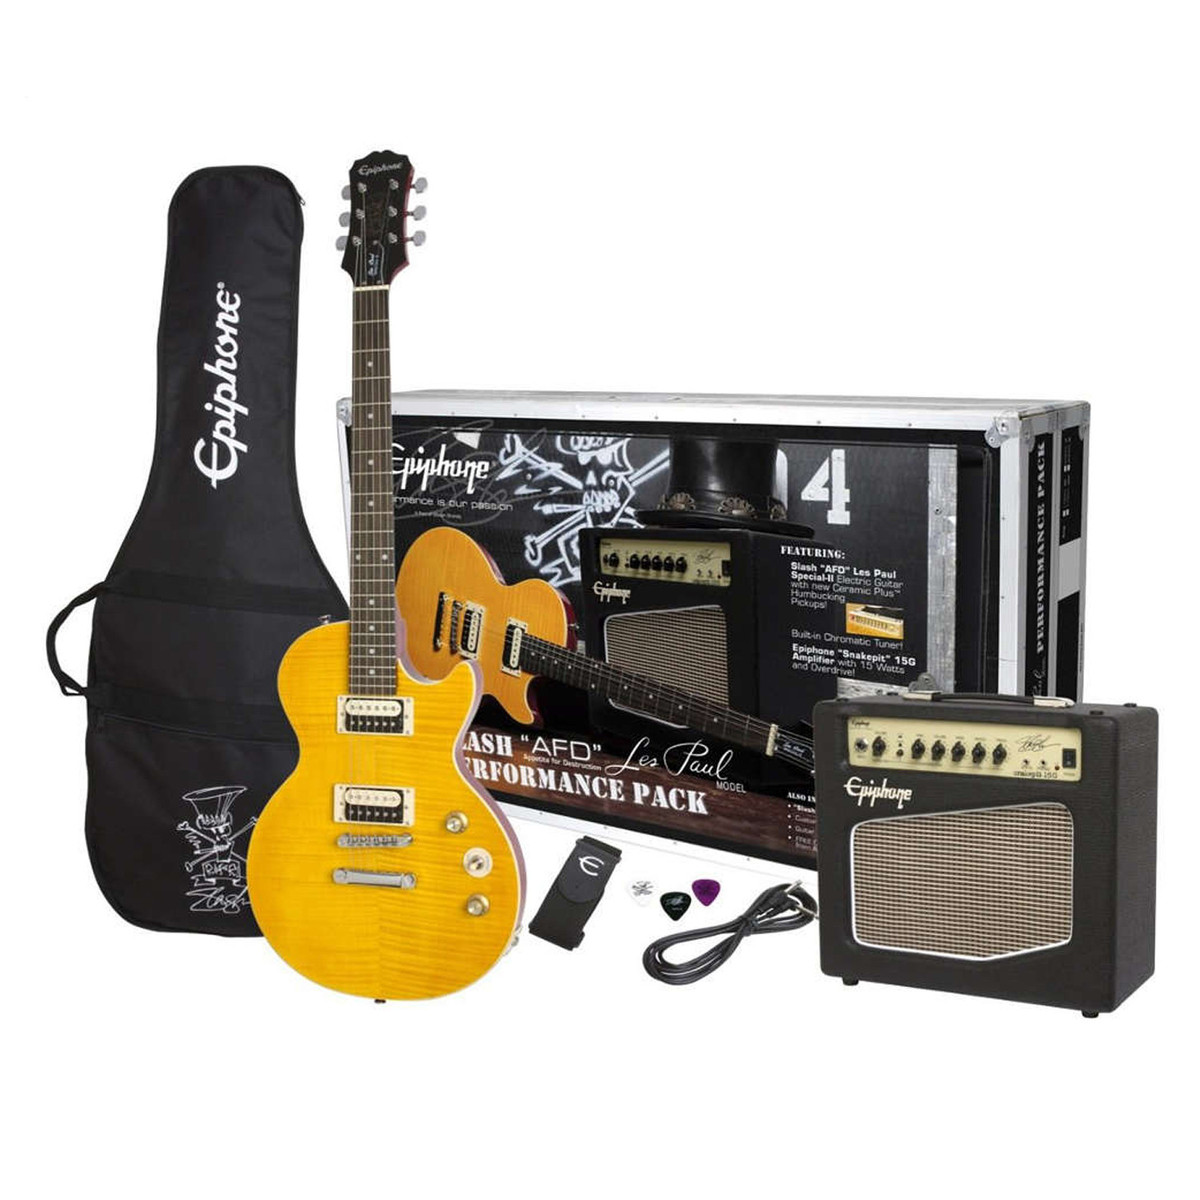 epiphone slash 39 afd 39 les paul special ii guitar and amp pack at. Black Bedroom Furniture Sets. Home Design Ideas